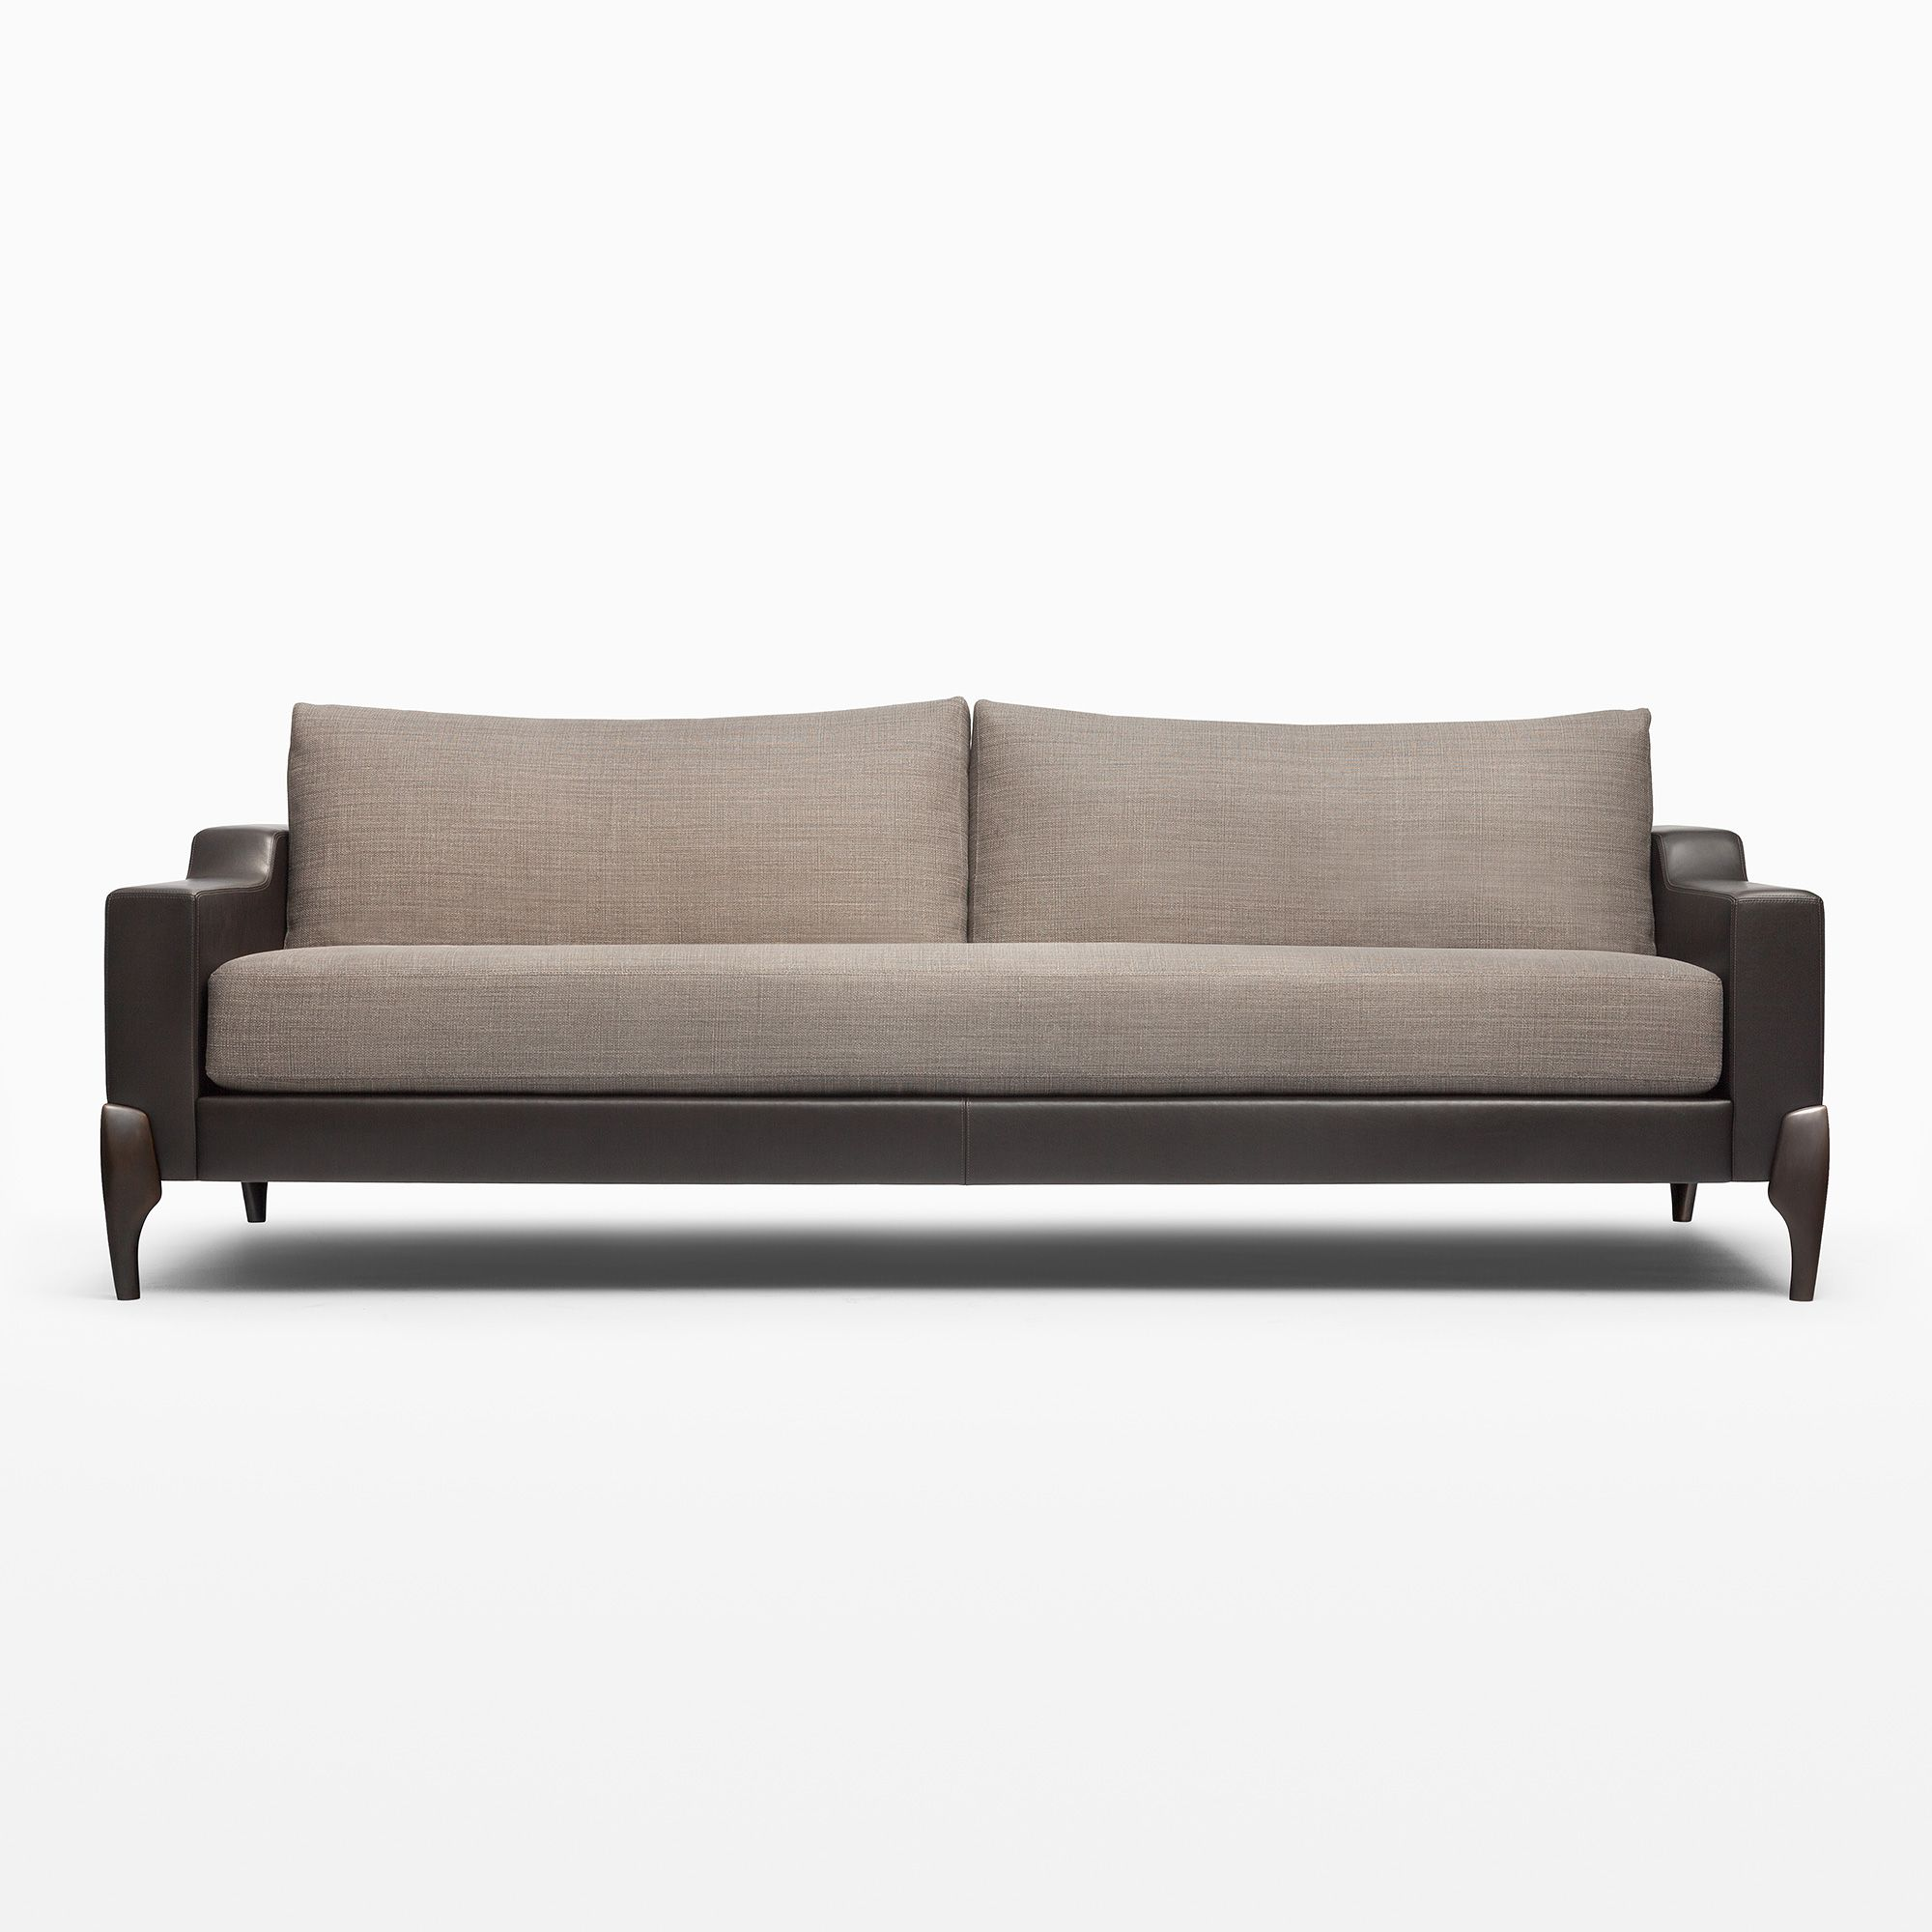 Sleek Sofas Chalk Sofa  Caste Design  Sofa & Chair & Stool  Pinterest